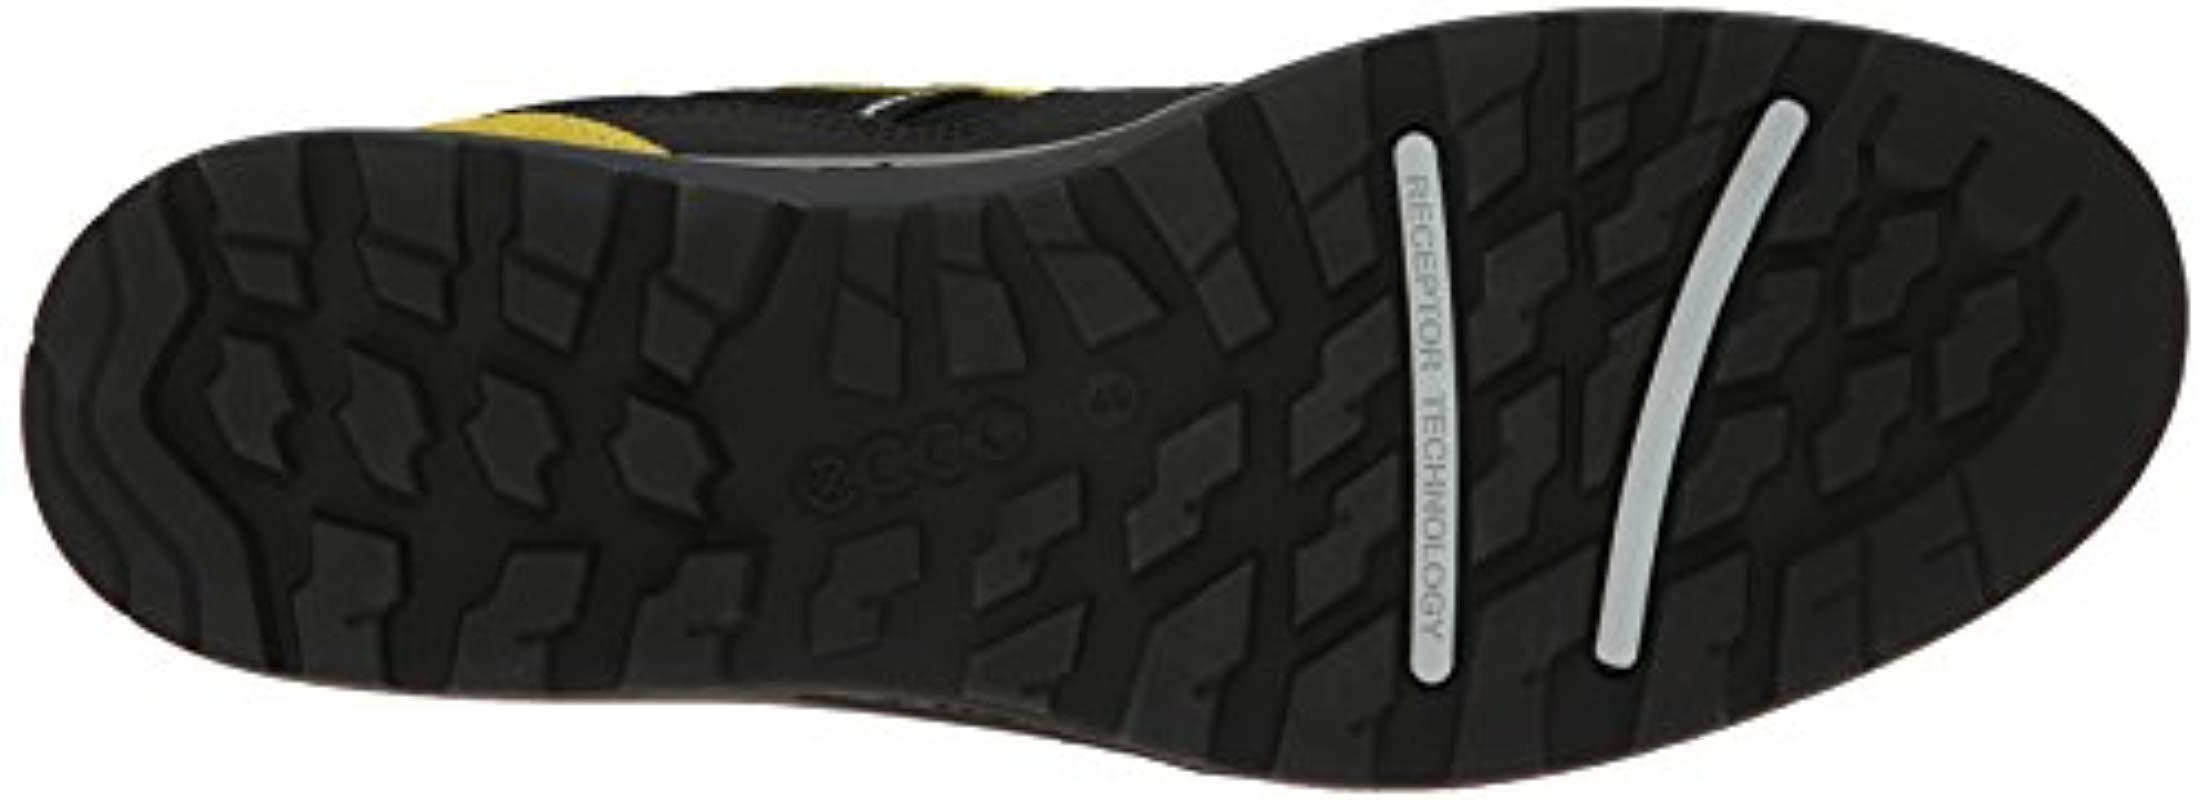 pretty nice cute low price Ecco Yura Ladies Multisport Outdoor Shoes in Black - Save 2 ...